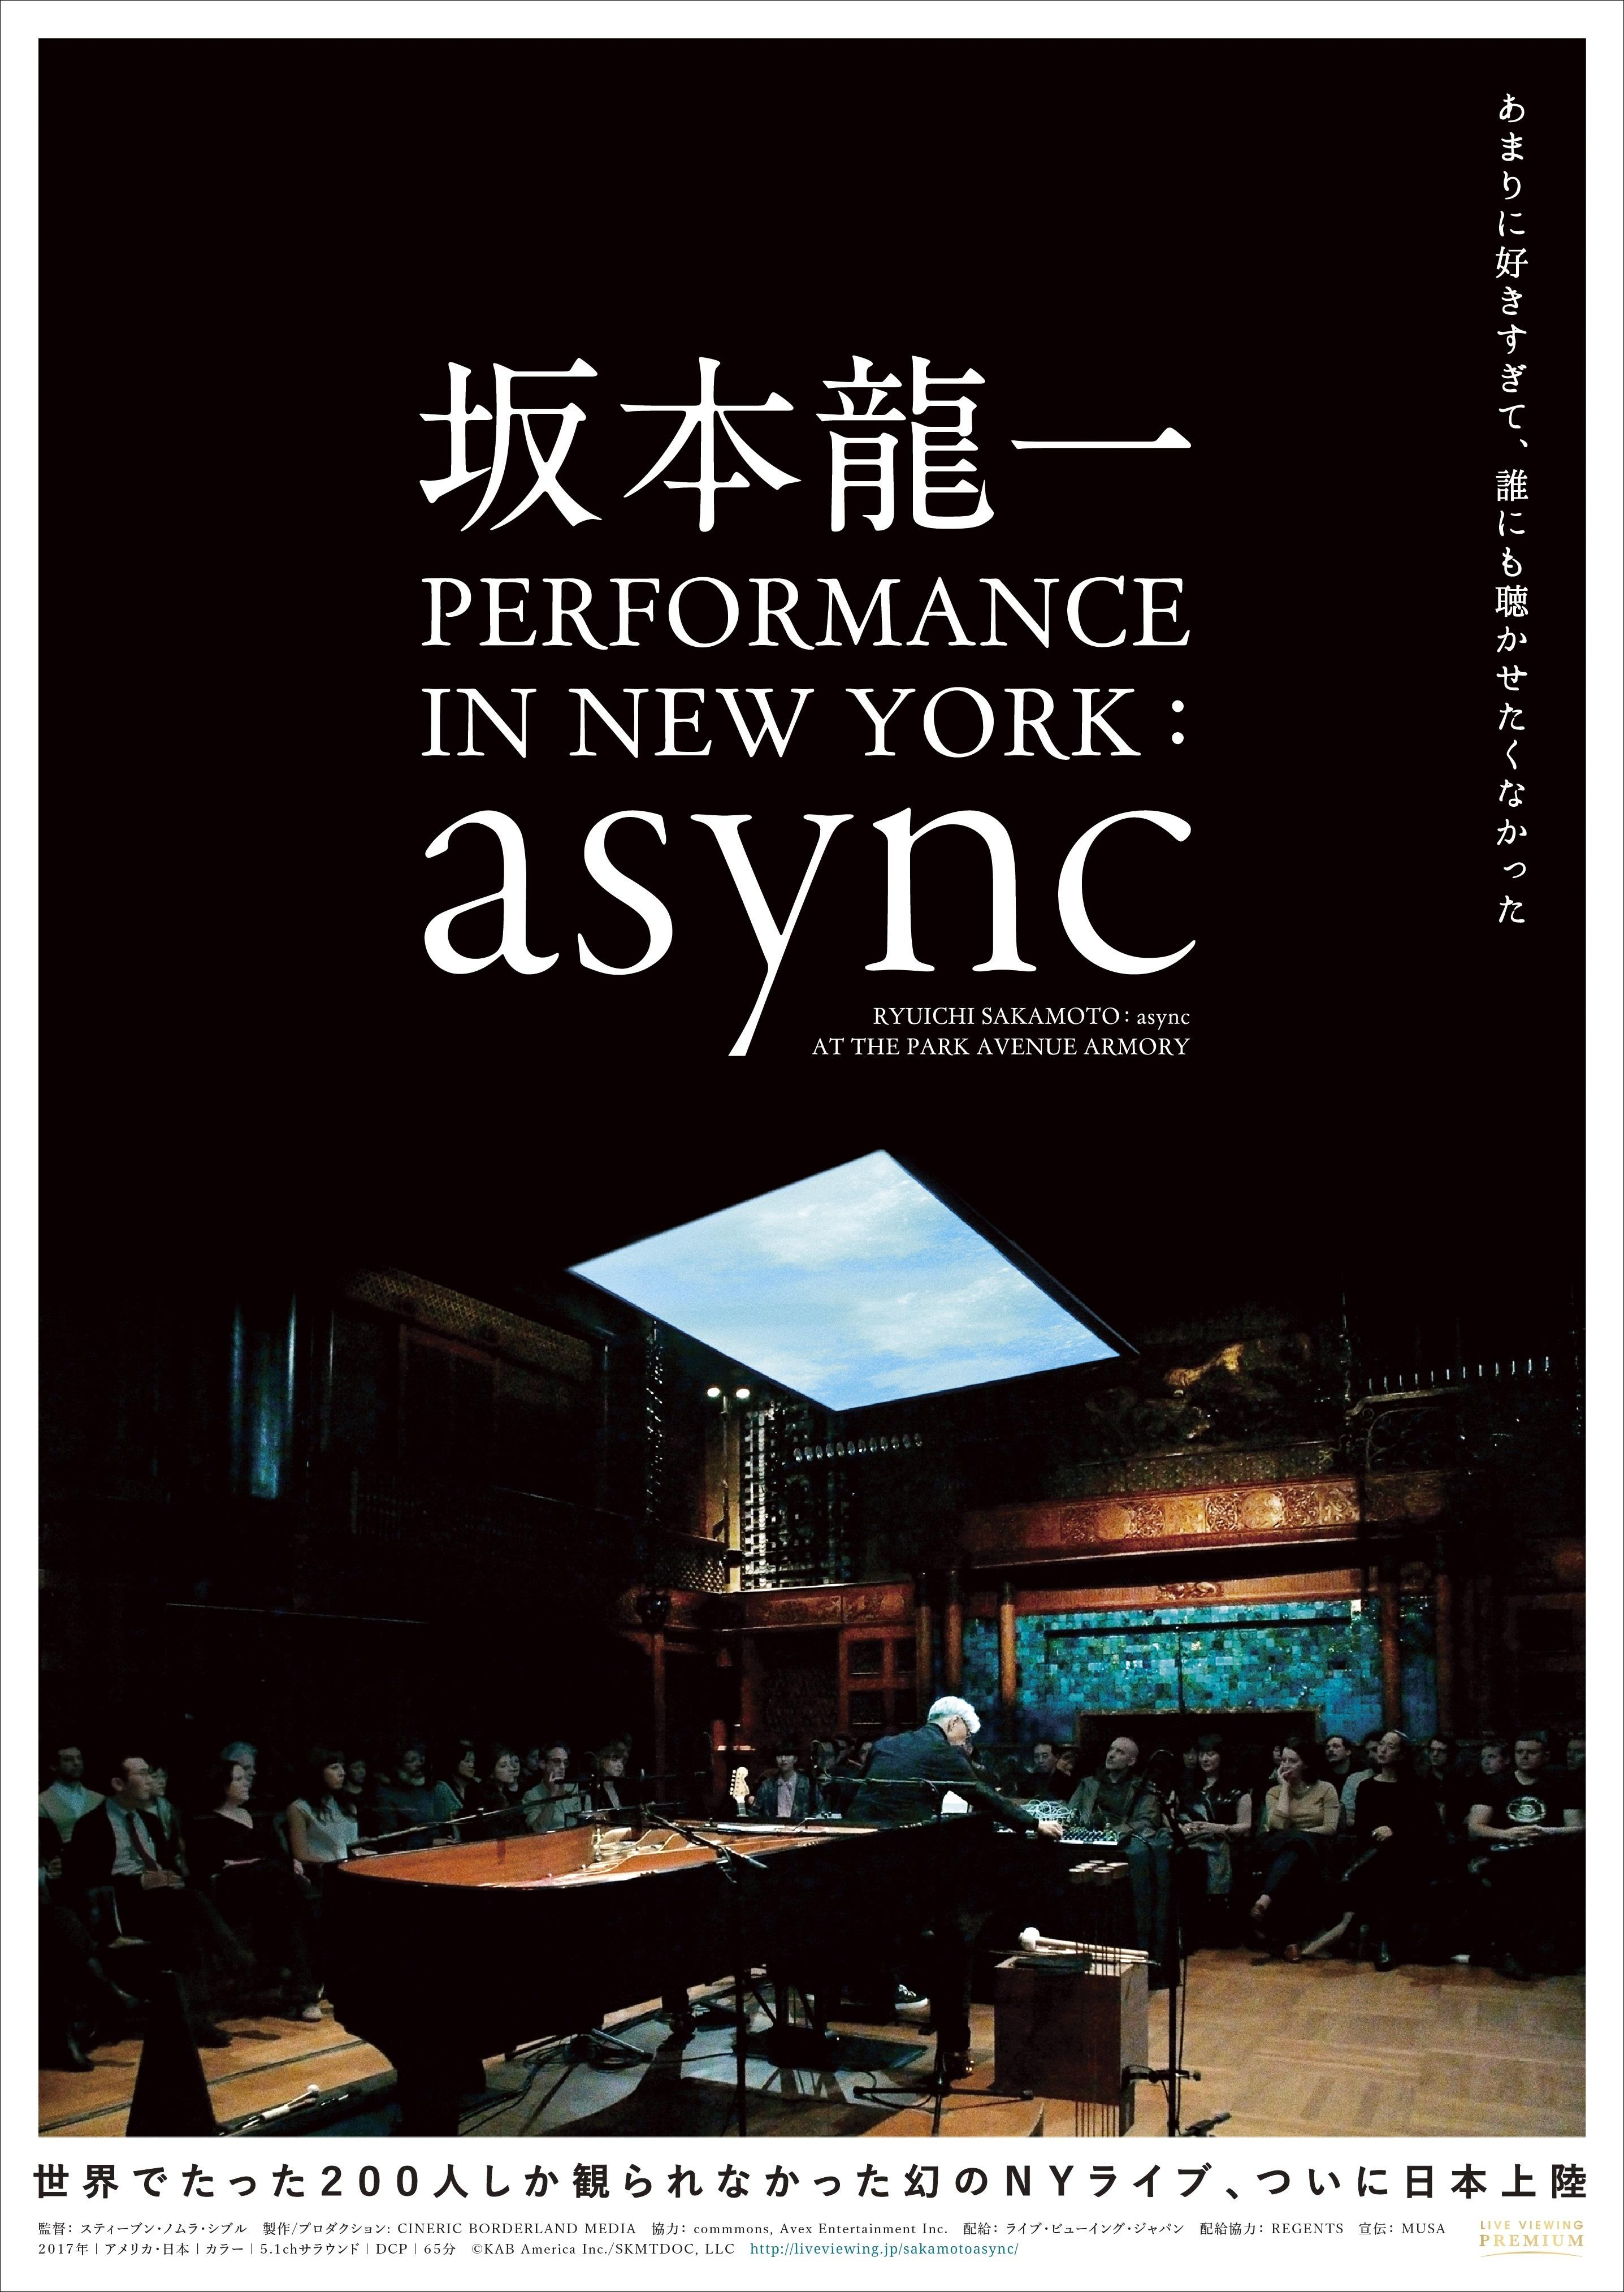 http://www.commmons.com/2018/05/25/PERFORMANCE%20IN%20NEW%20YORK_async_main.jpg